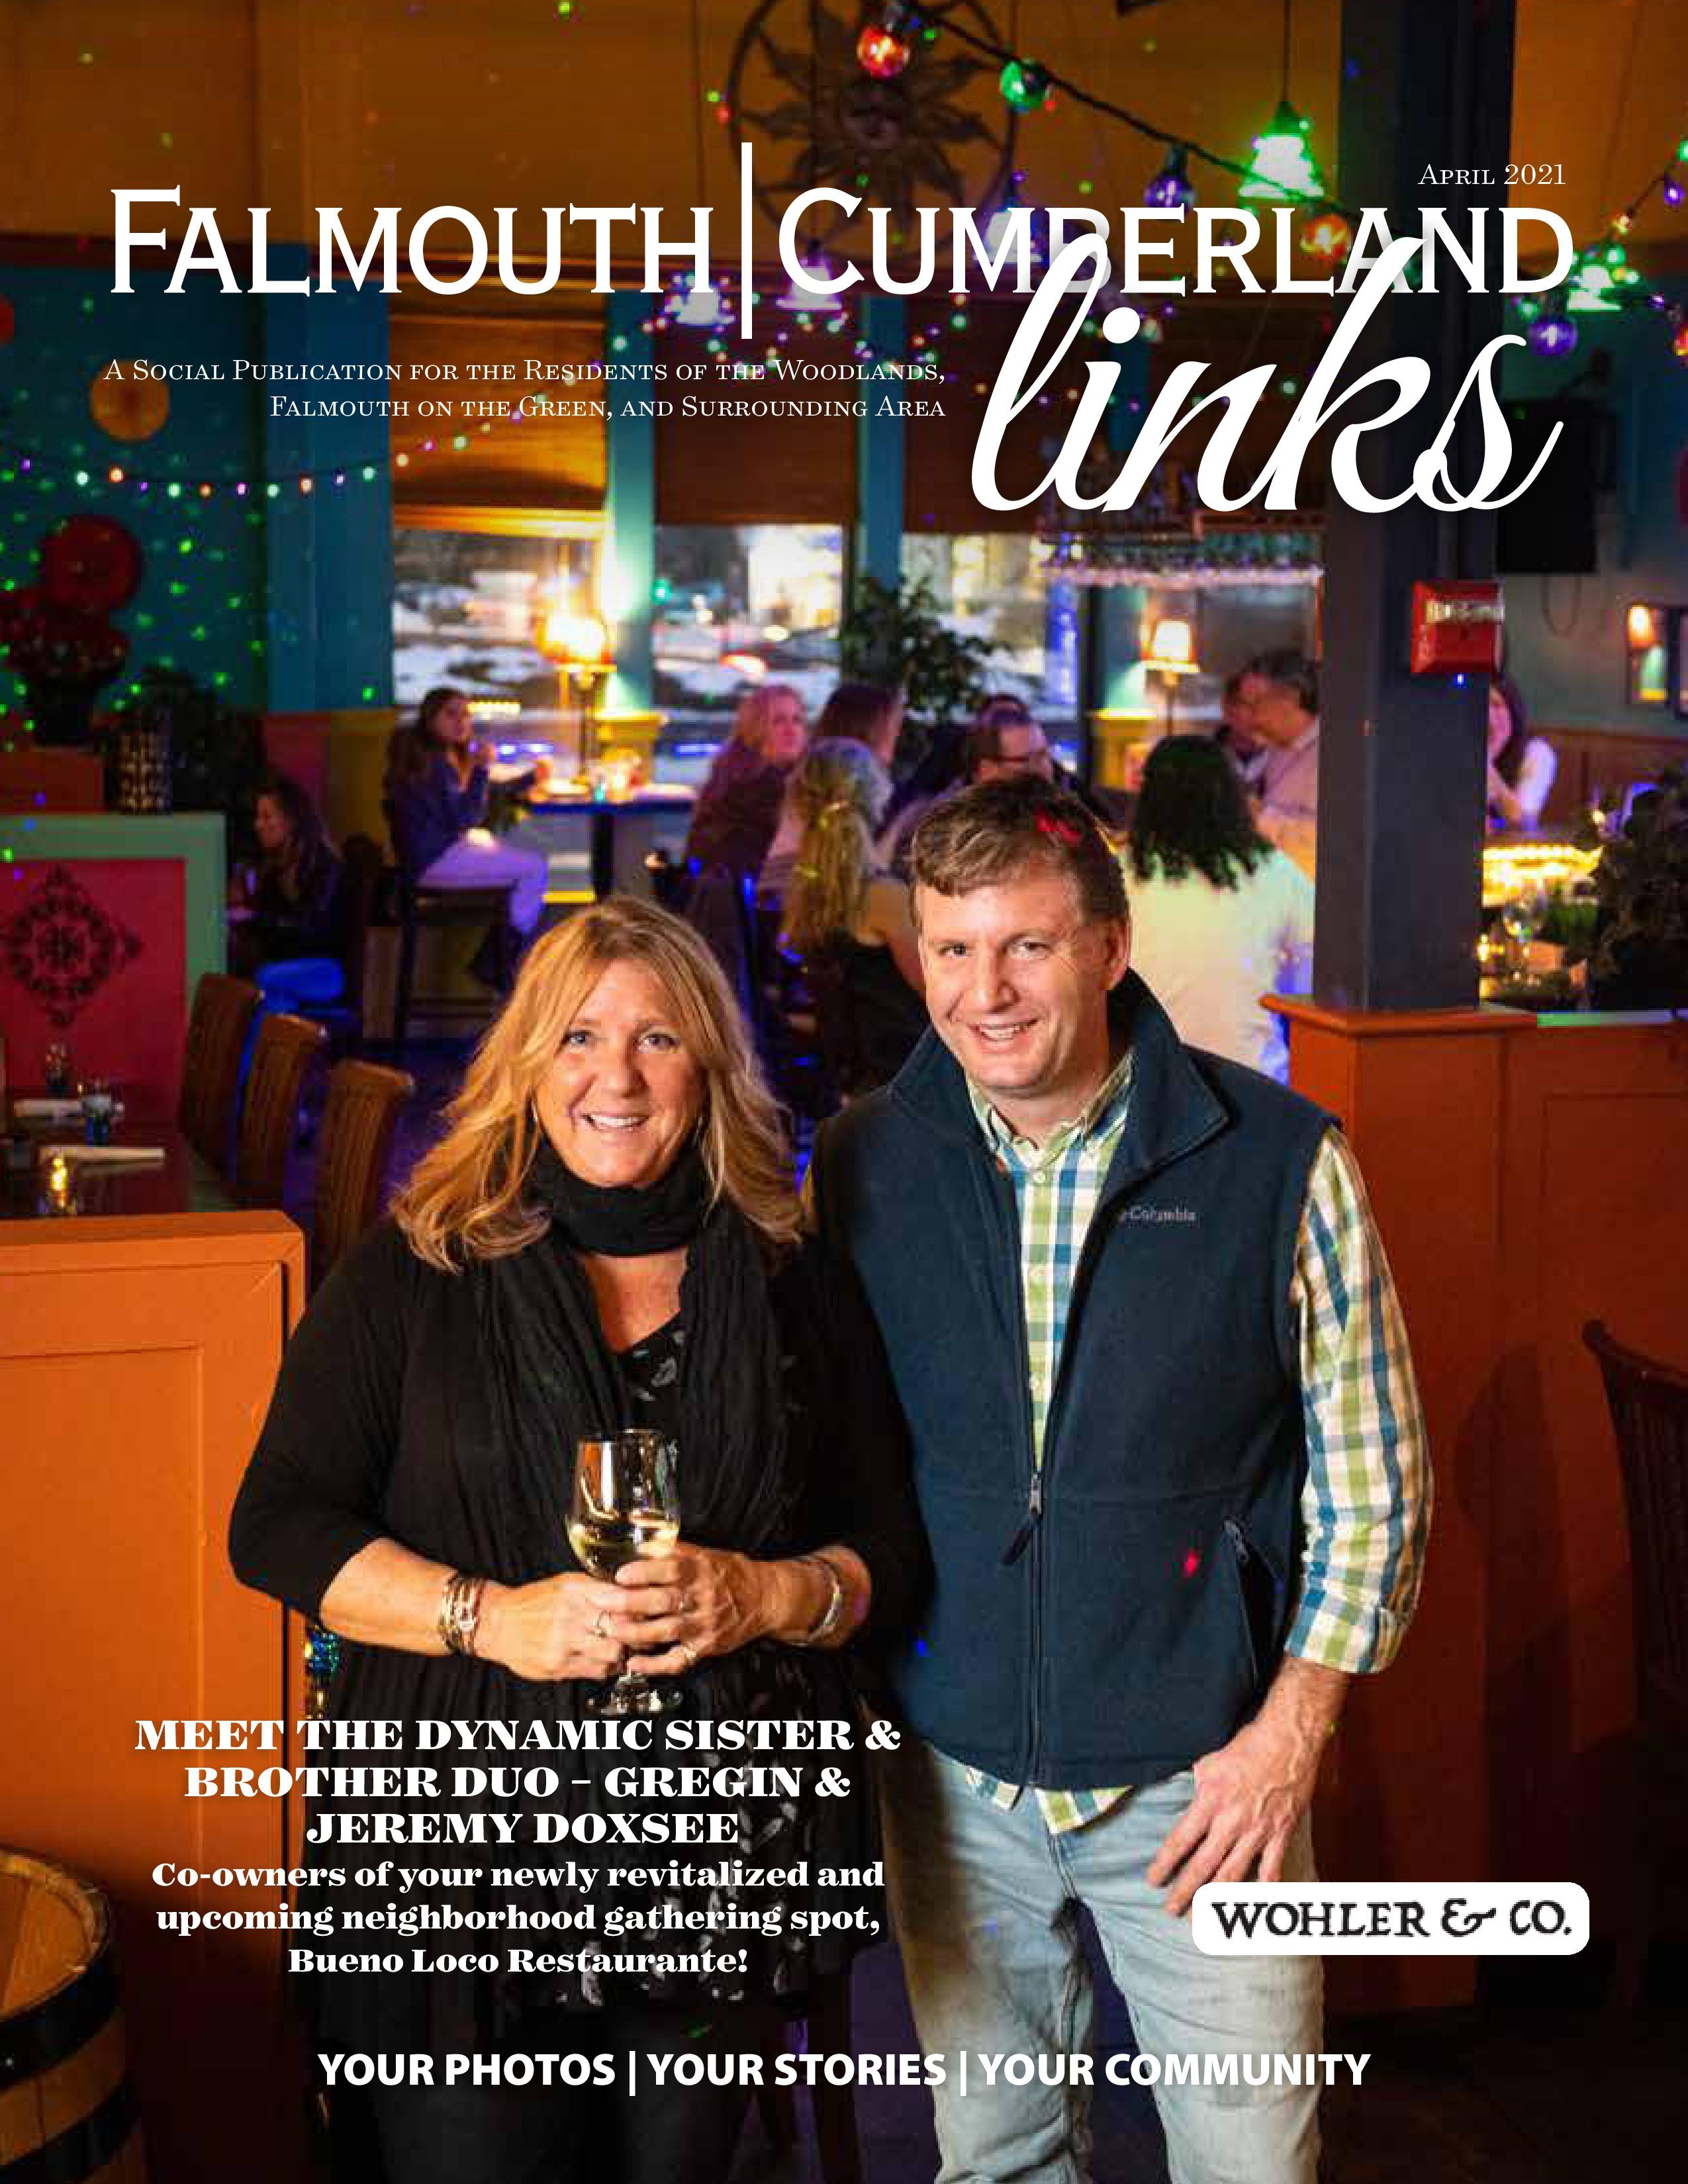 Falmouth Cumberland Links 2021-04-01